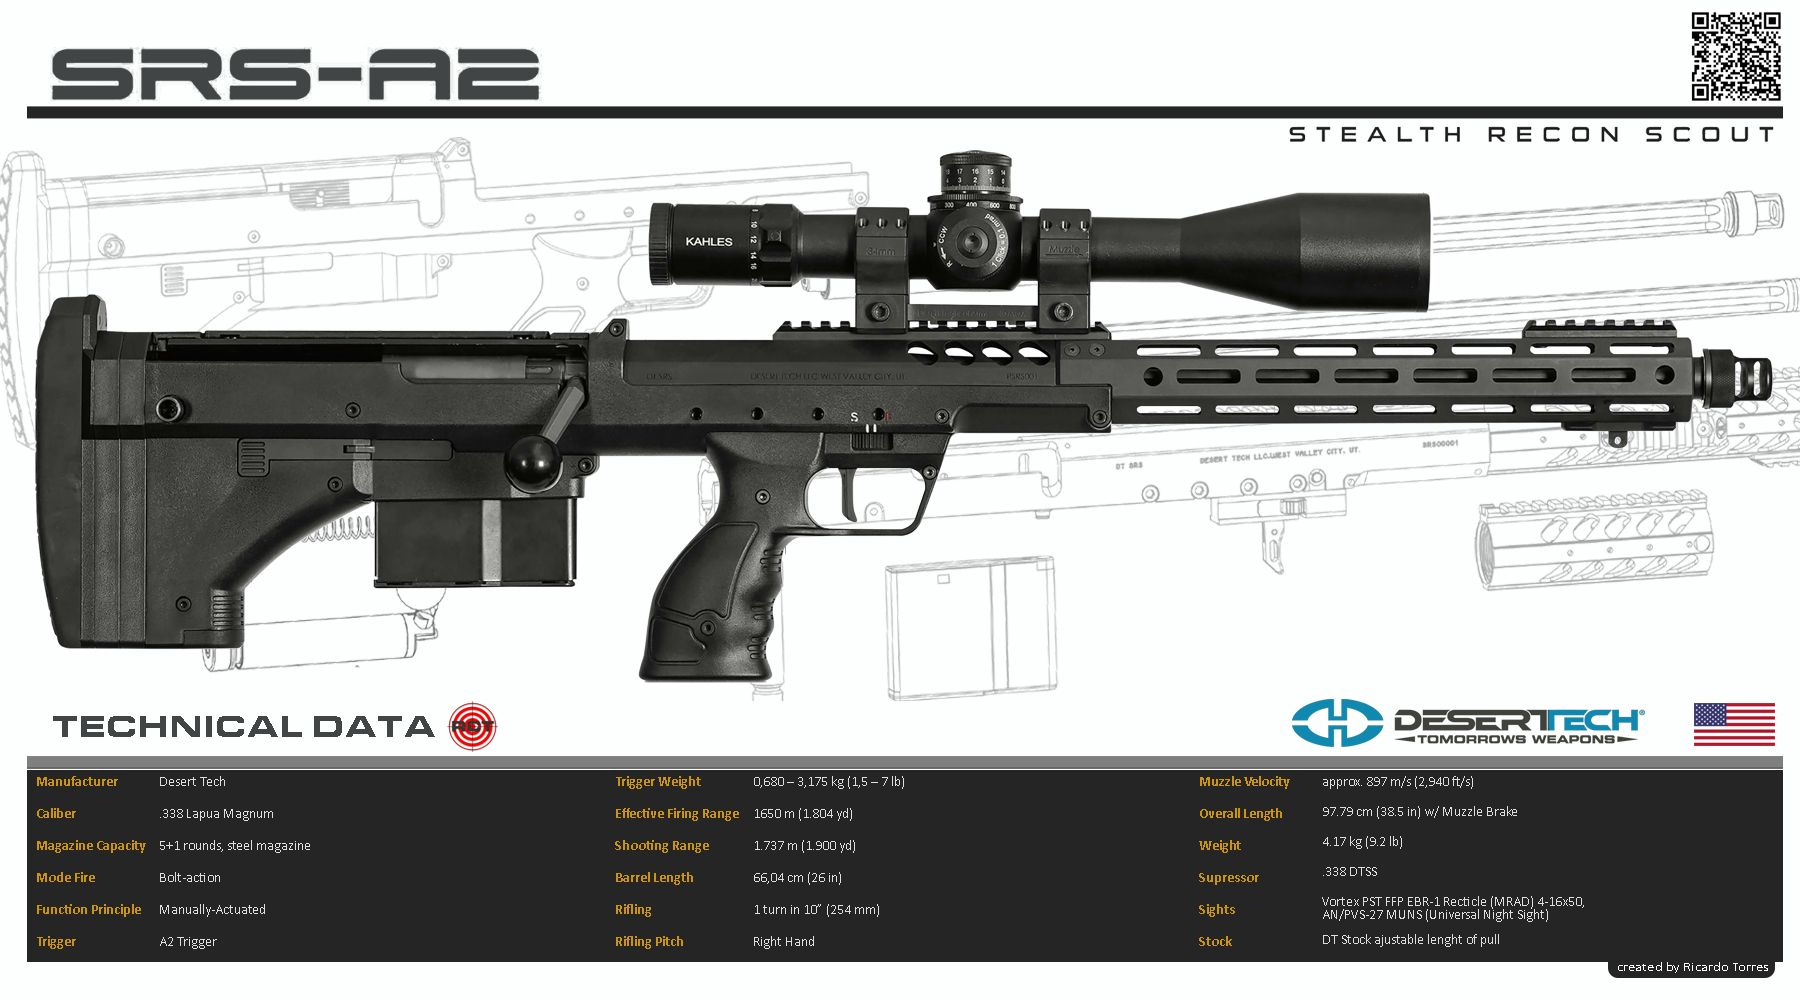 Desert Tech SRSA2 Espingardas, Fuzil de assalto, Fuzil